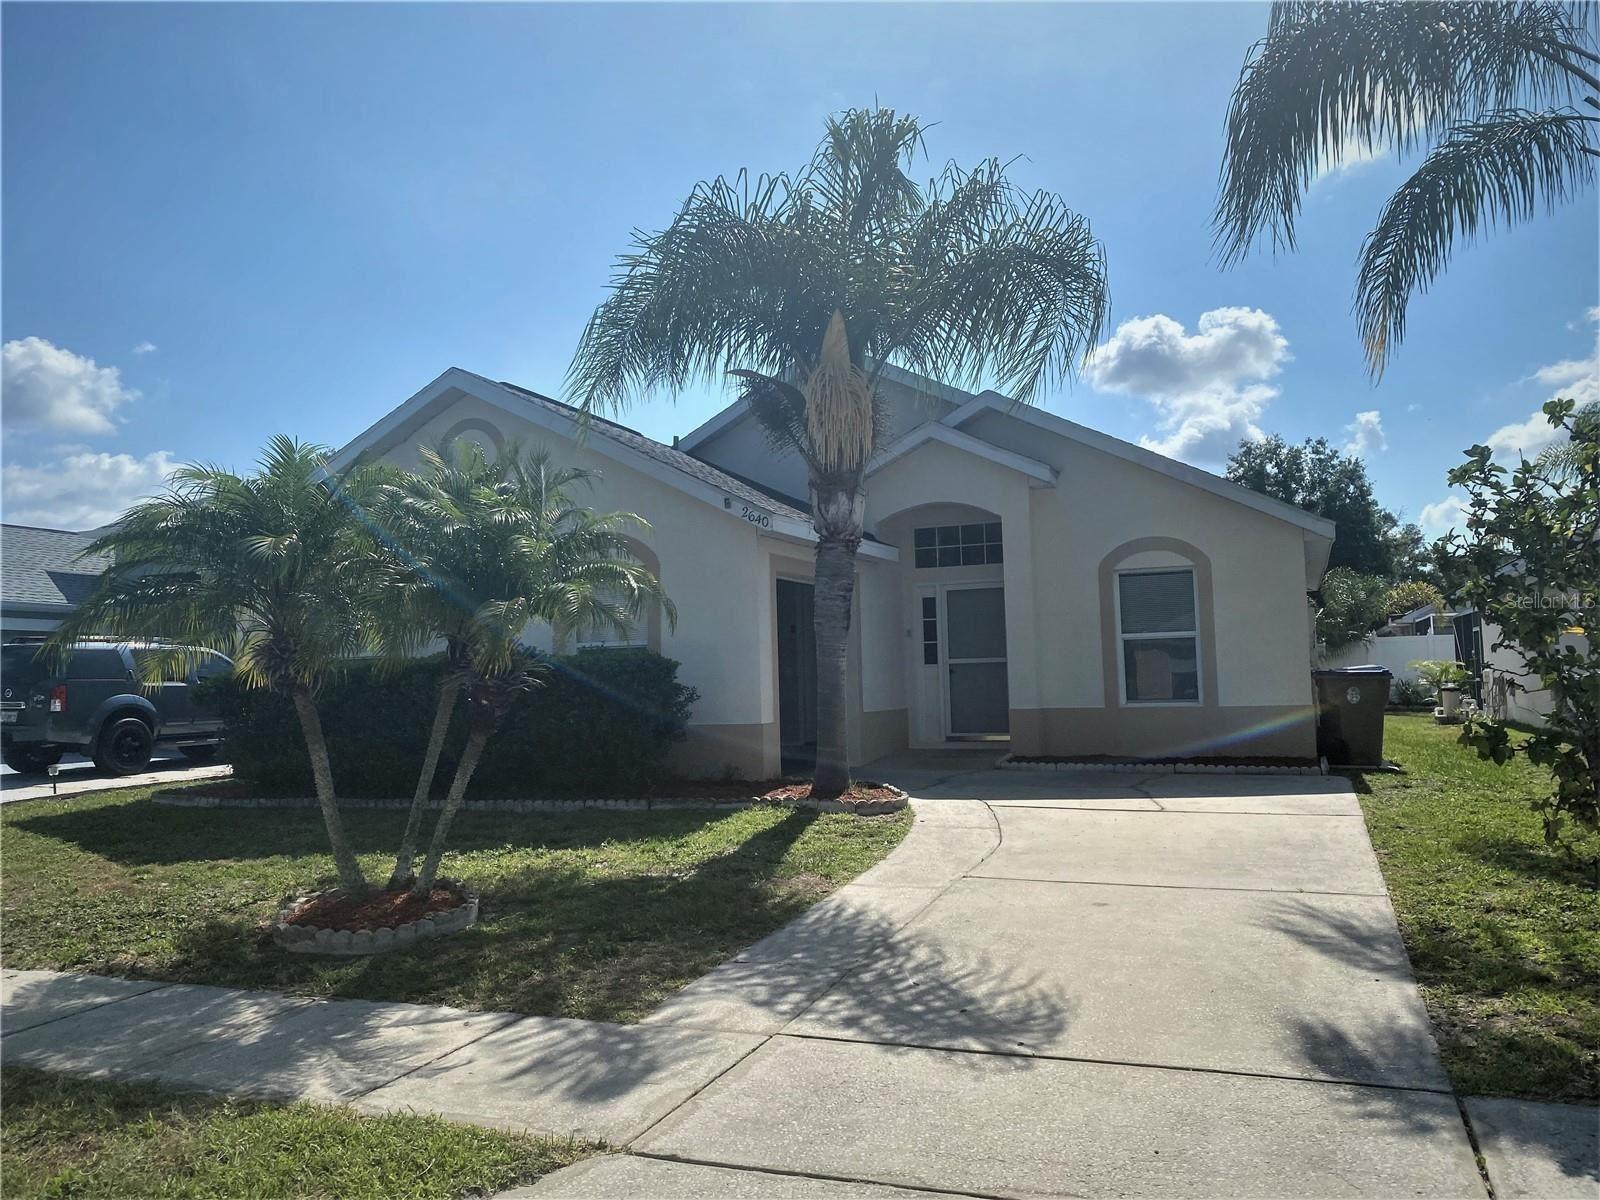 2640 CHATHAM CIRCLE, Kissimmee, FL 34746 - #: O5951800